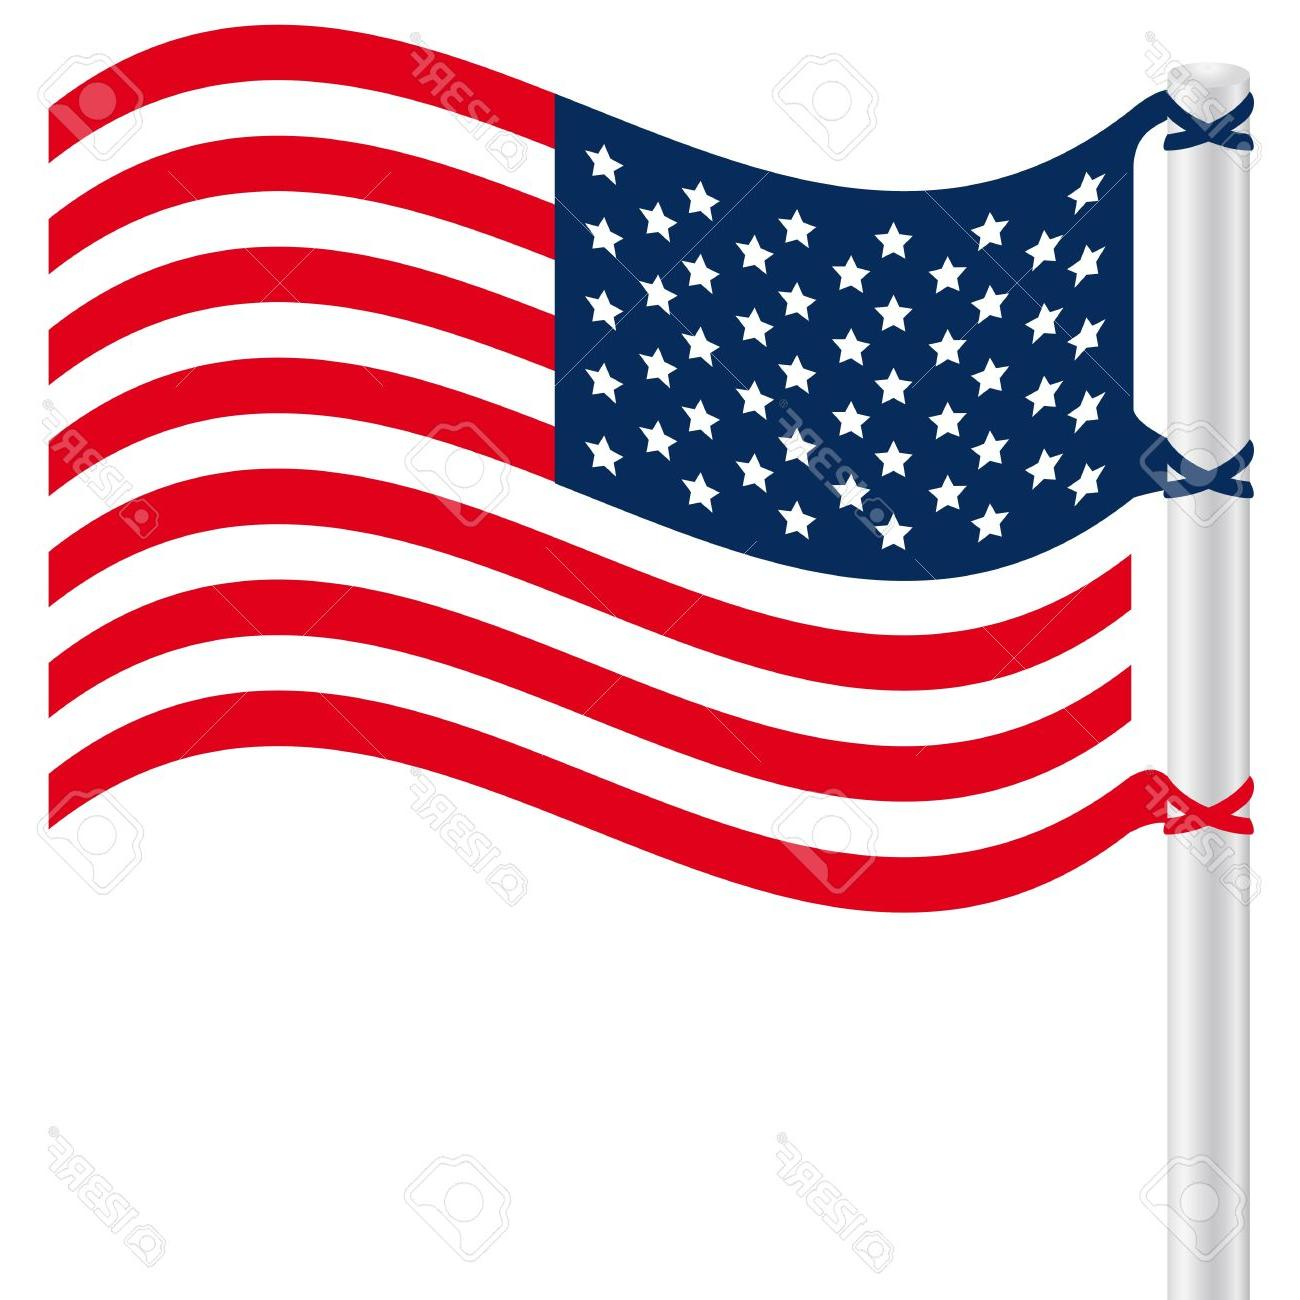 1300x1300 Best Free Waving American Flag Clip Art Design